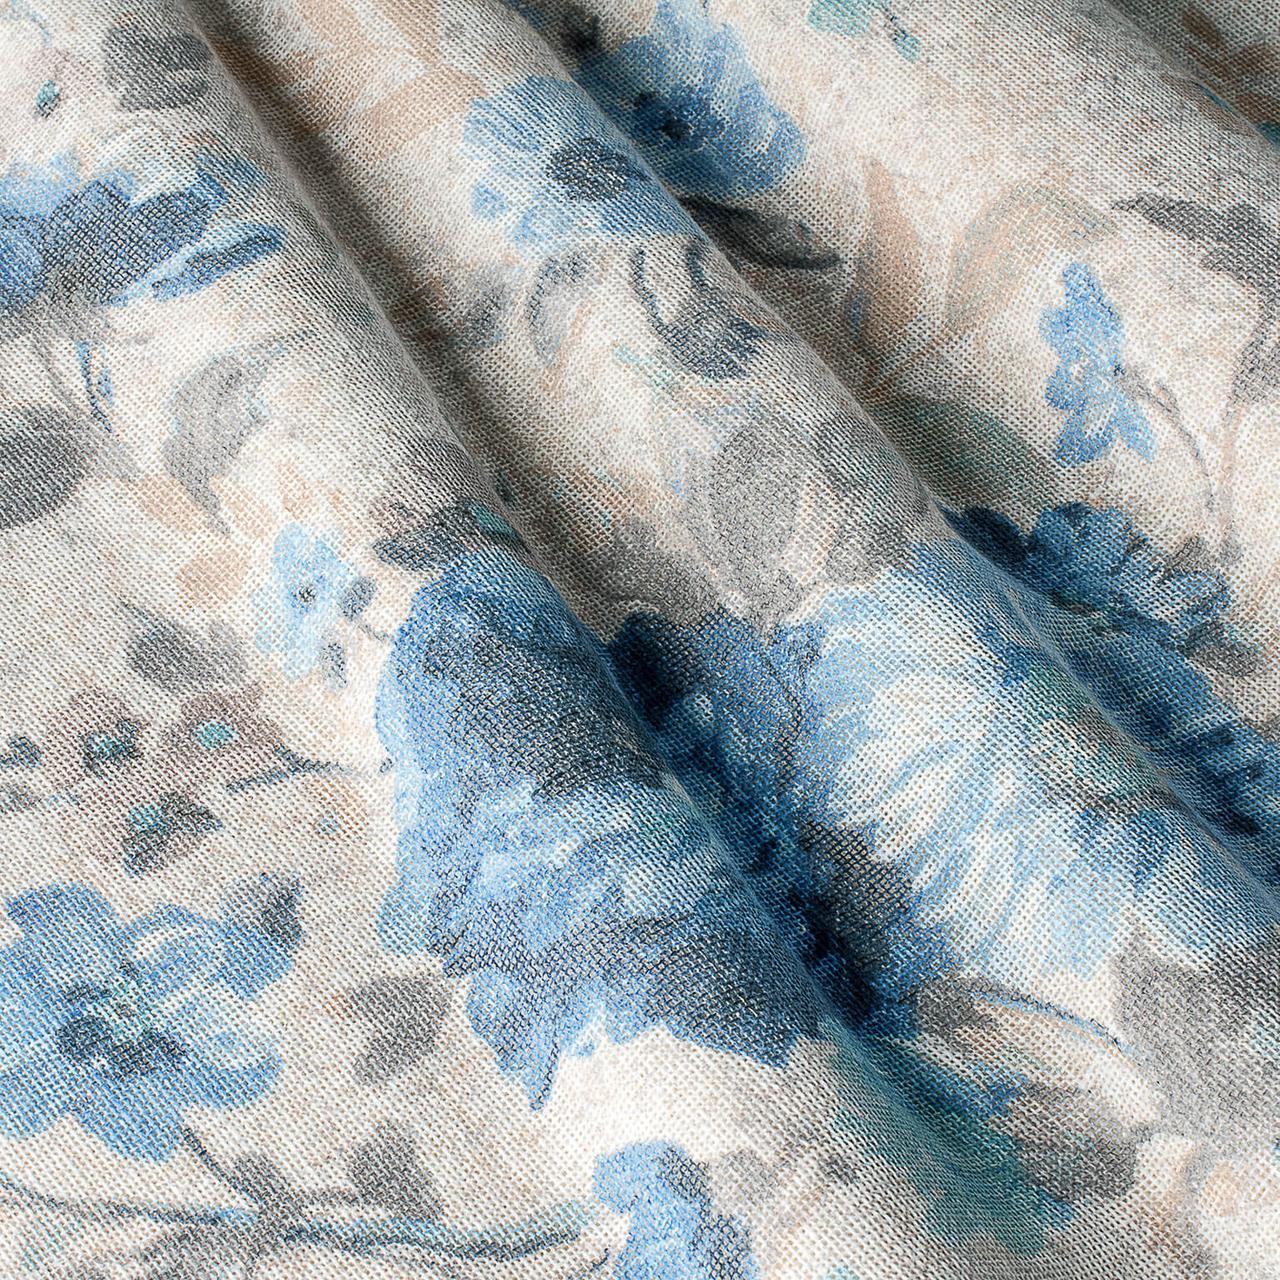 Гардинная ткань (тюль) 400259v1